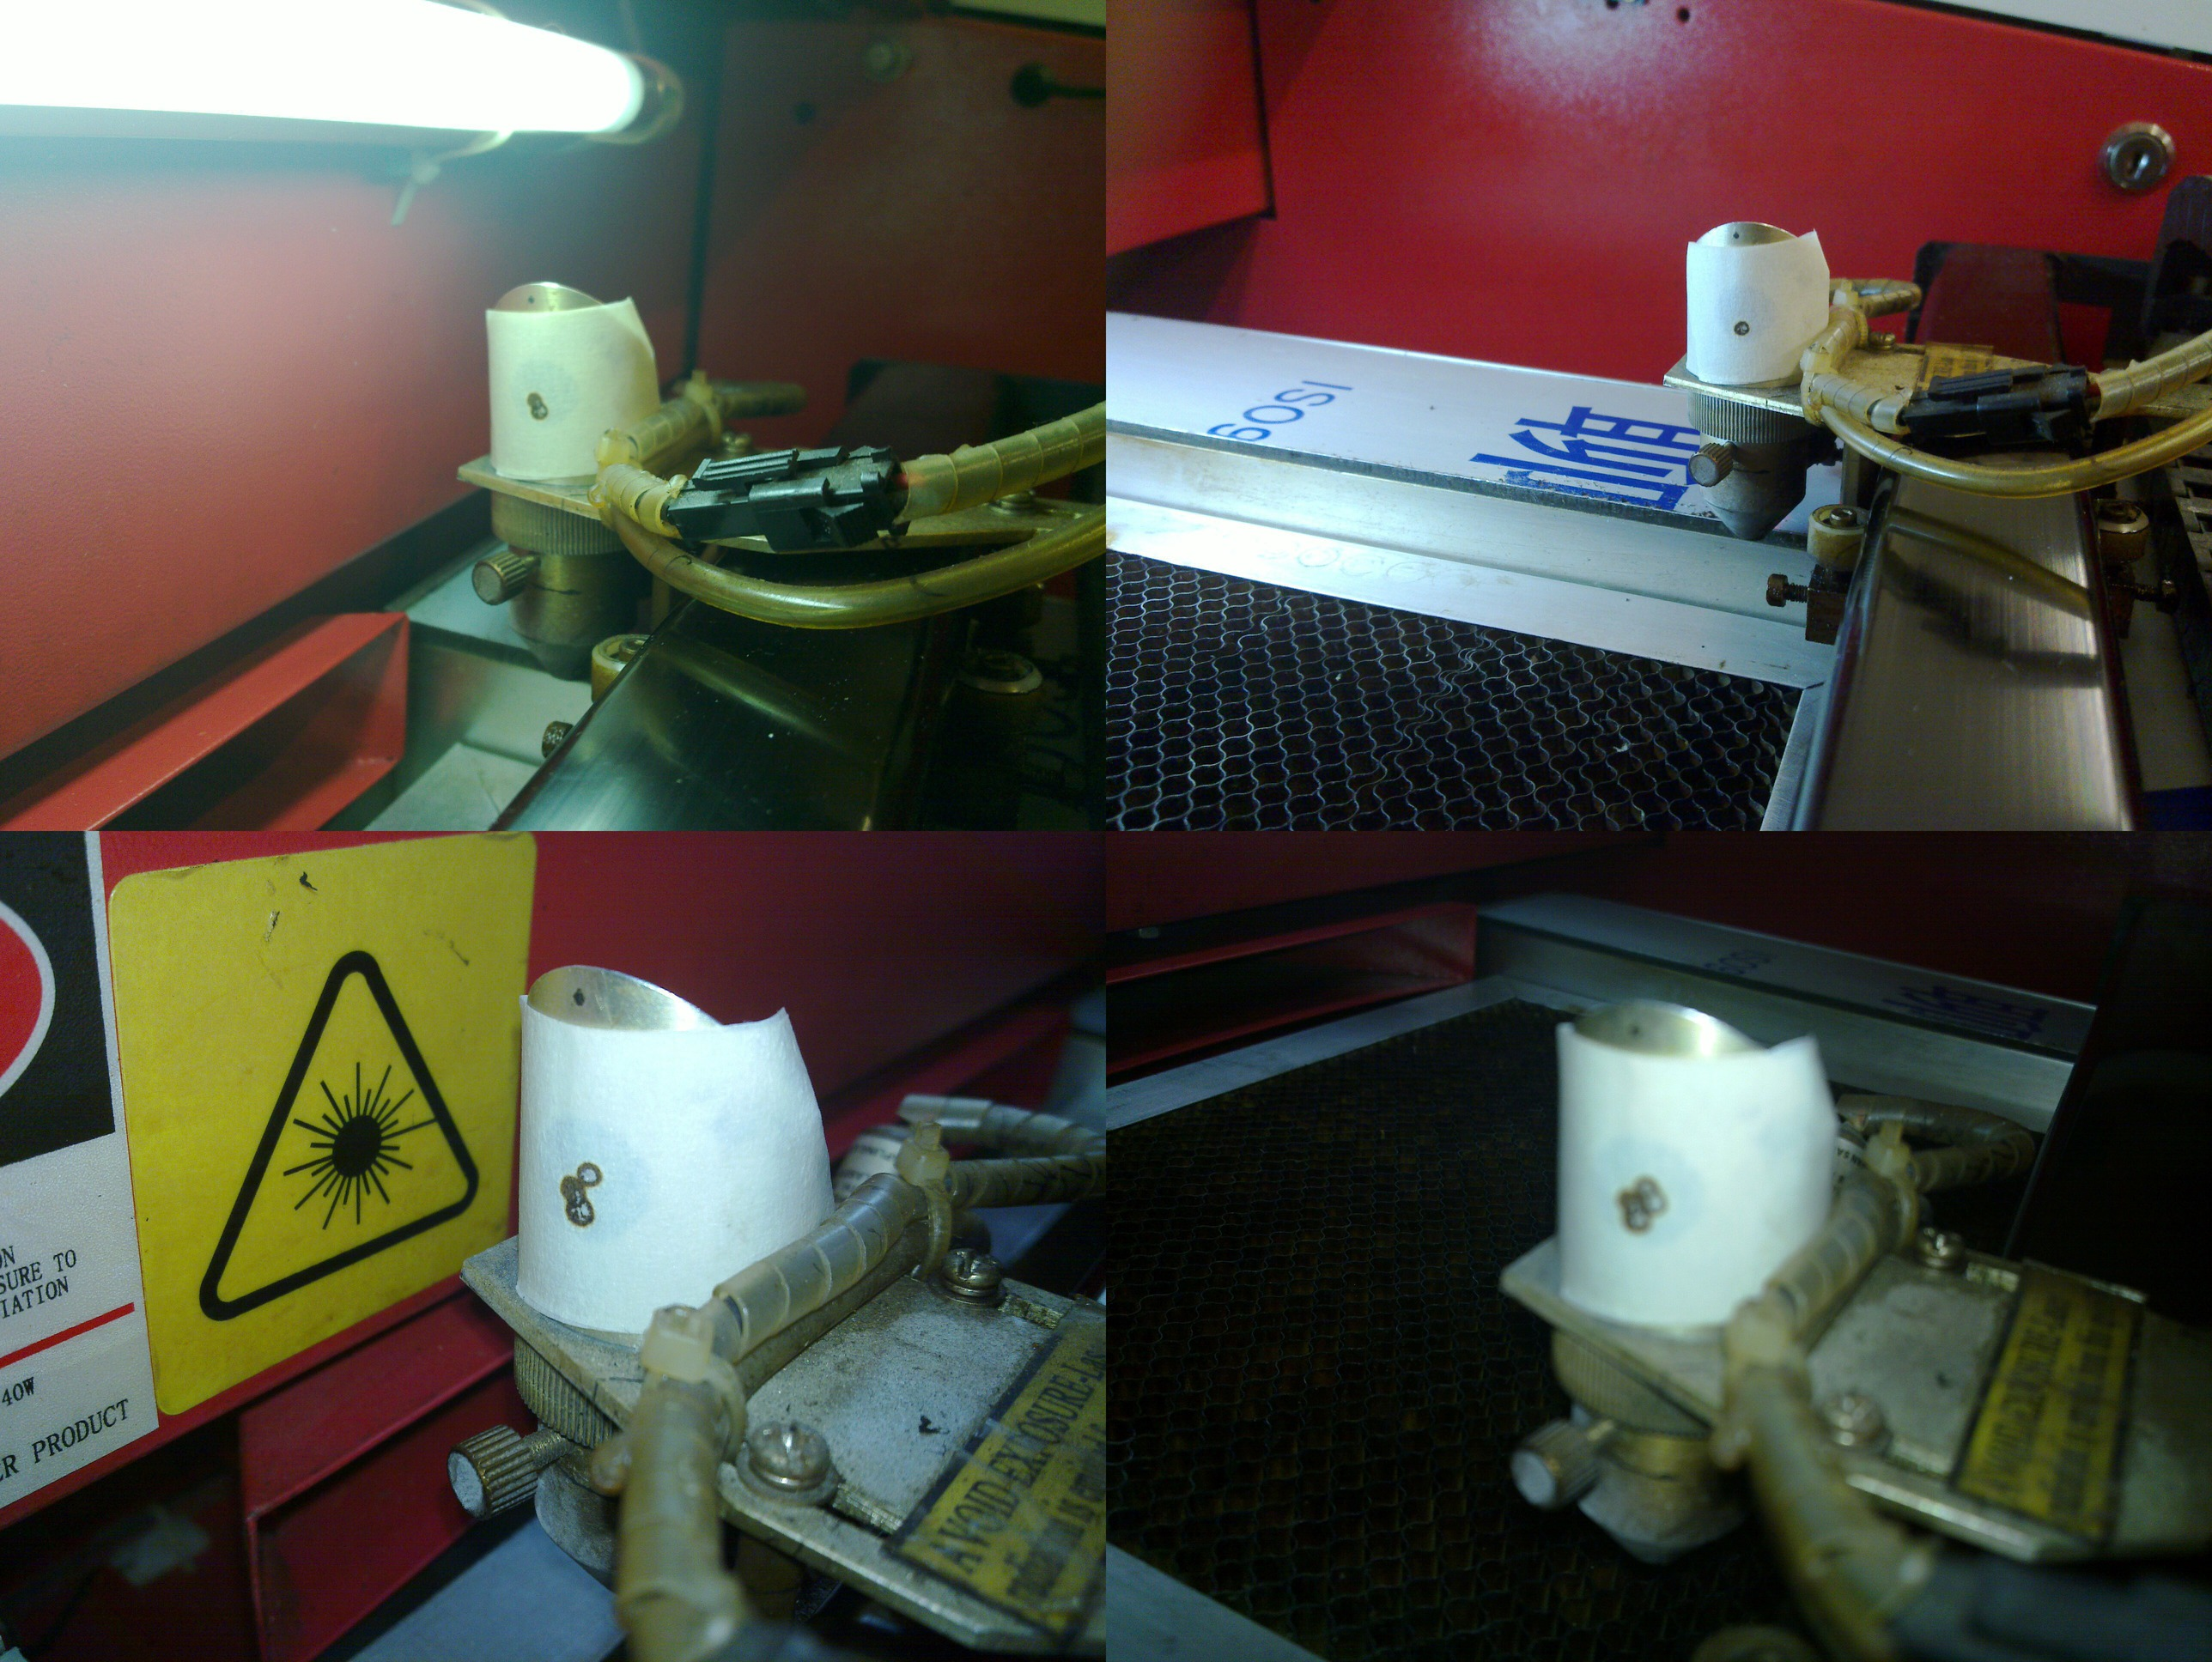 Laser Alignment Test Shots - One shot taken in each corner of the laser bed.